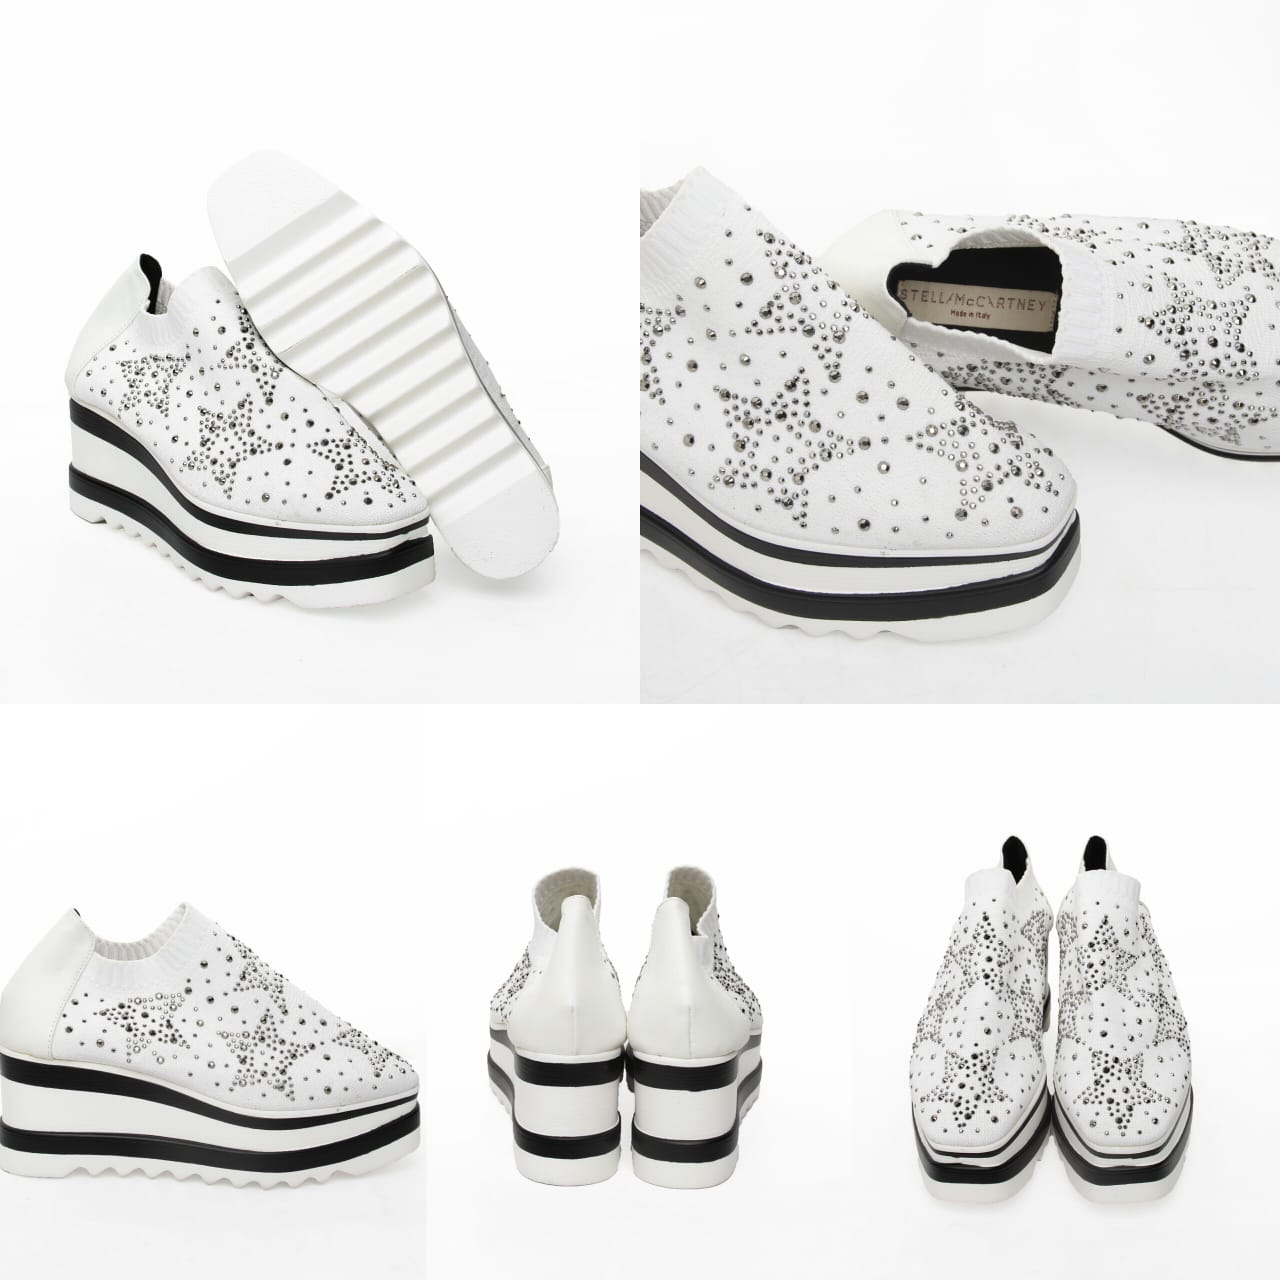 CollectionBatam | Sepatu Stella Mccartney Wedges Star ...